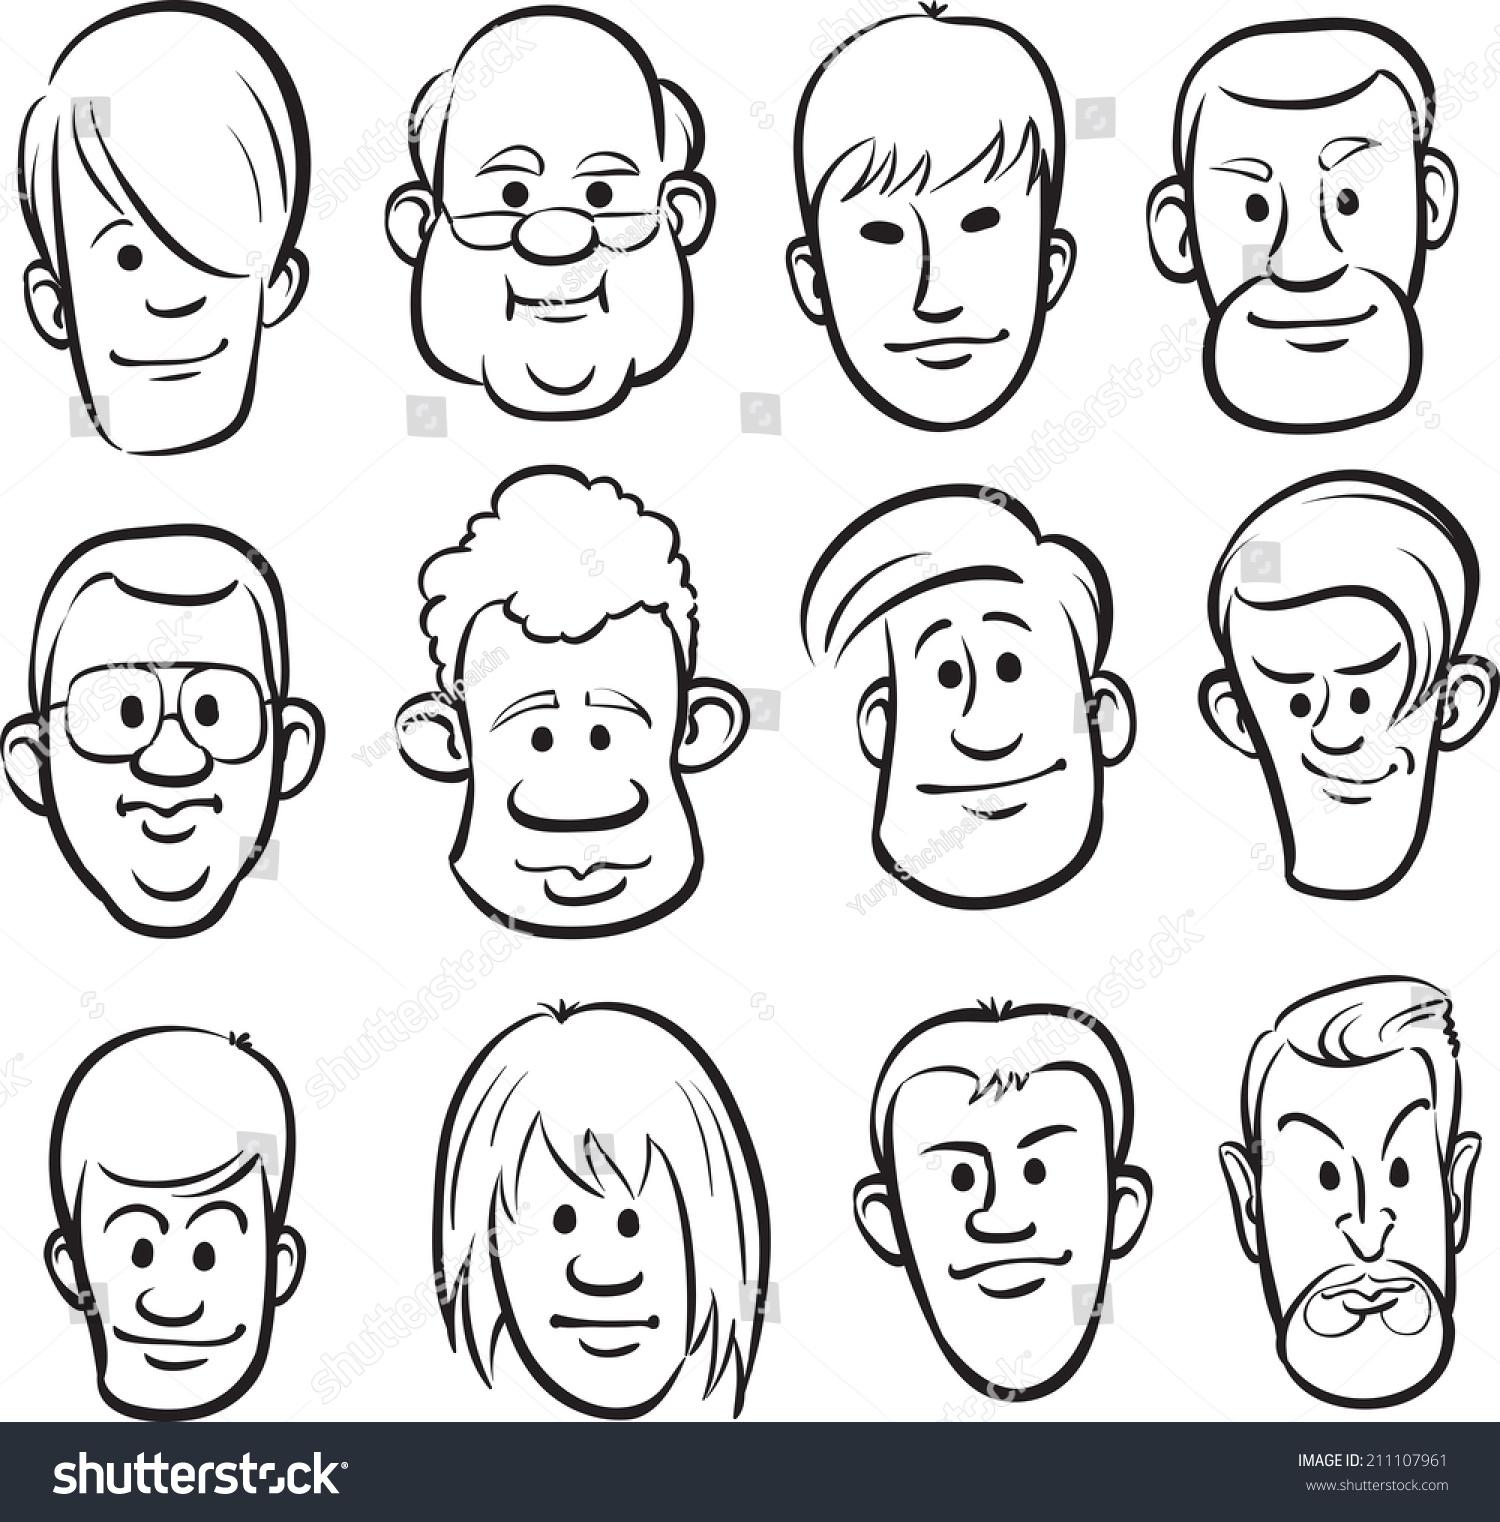 Whiteboard drawing men faces cartoon heads 211107961